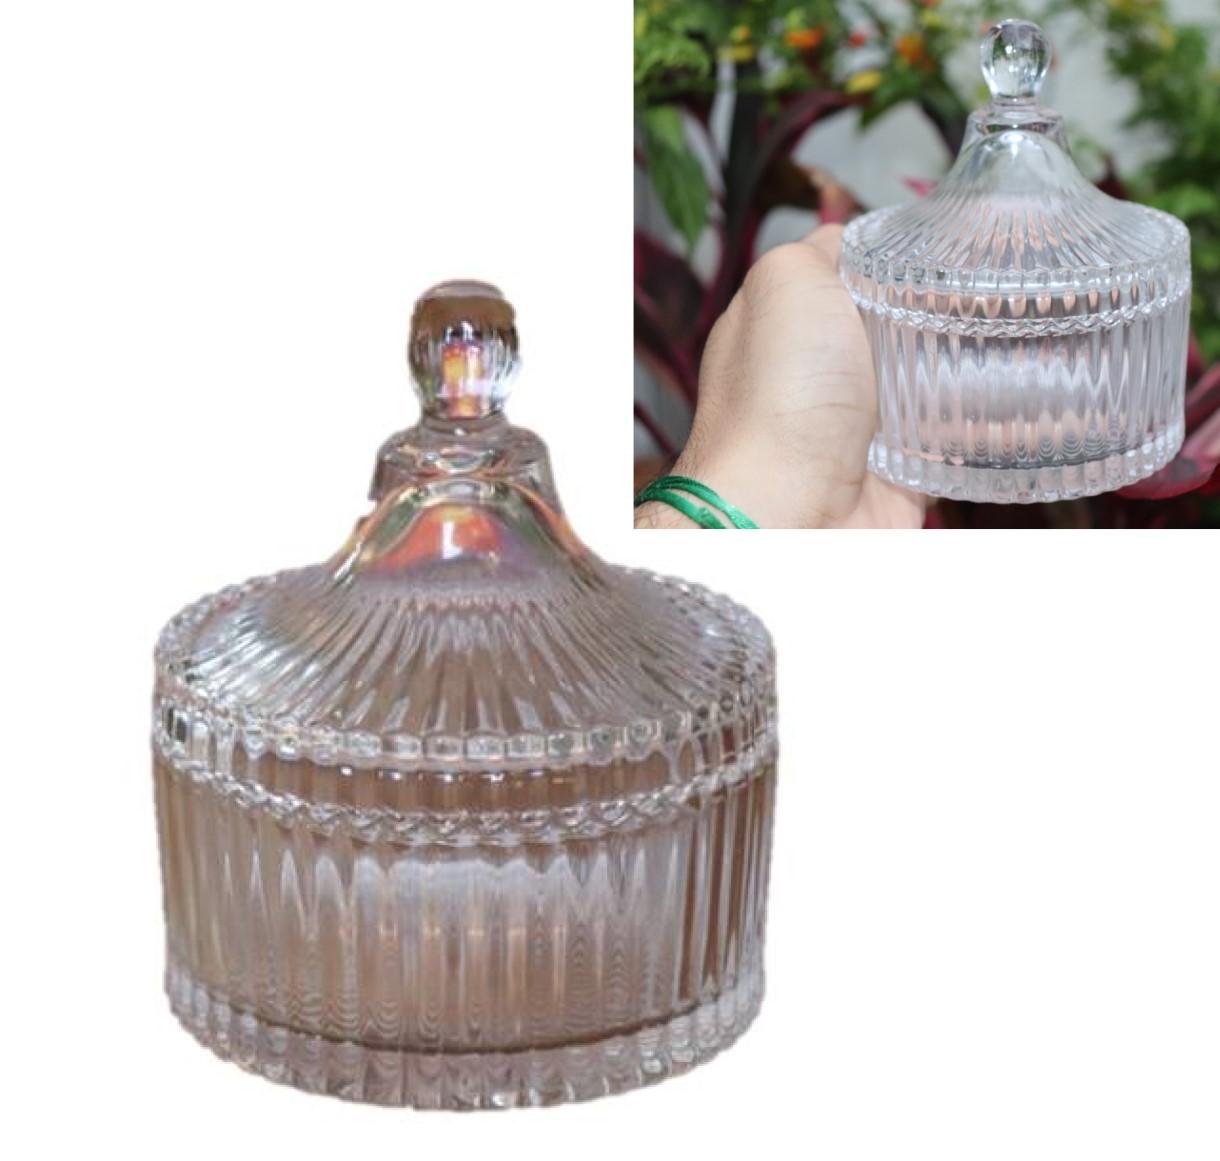 bomboniere de cristal potiche decoração sala A10,5x12,5 enfeite vidro vaso decorativo